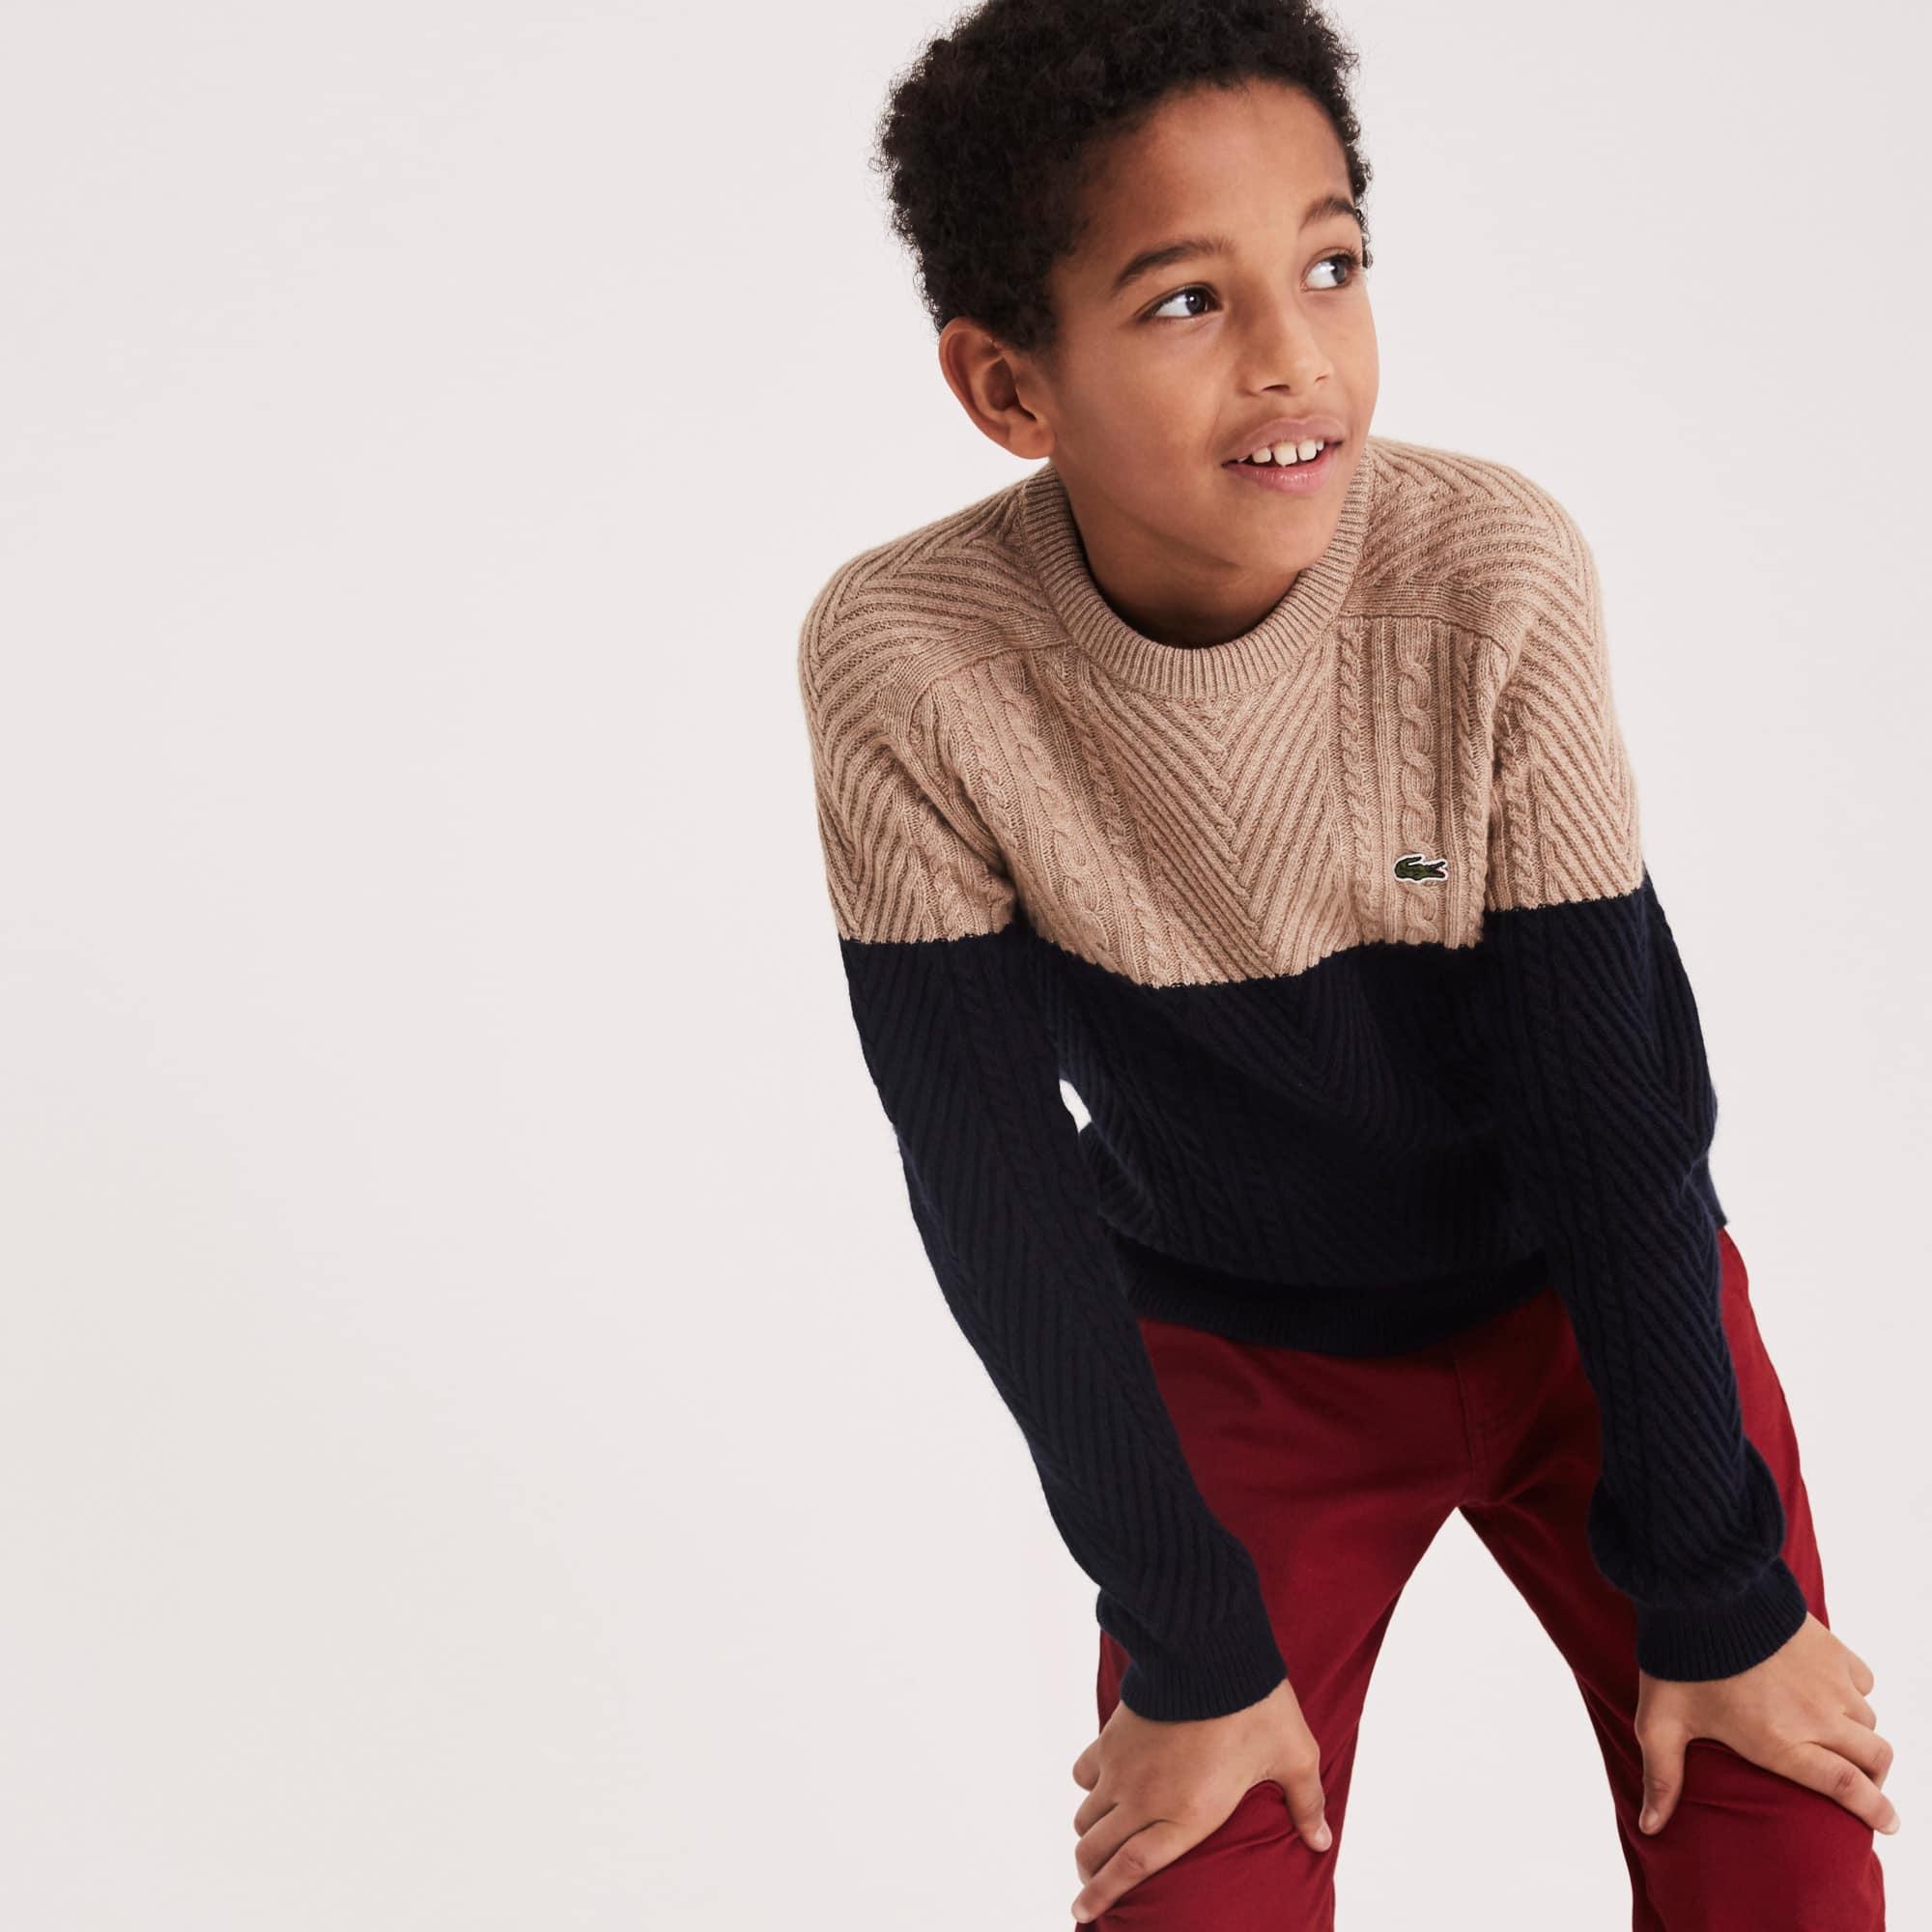 Boys' Crew Neck Cable Knit Colorblock Cotton Blend Sweater